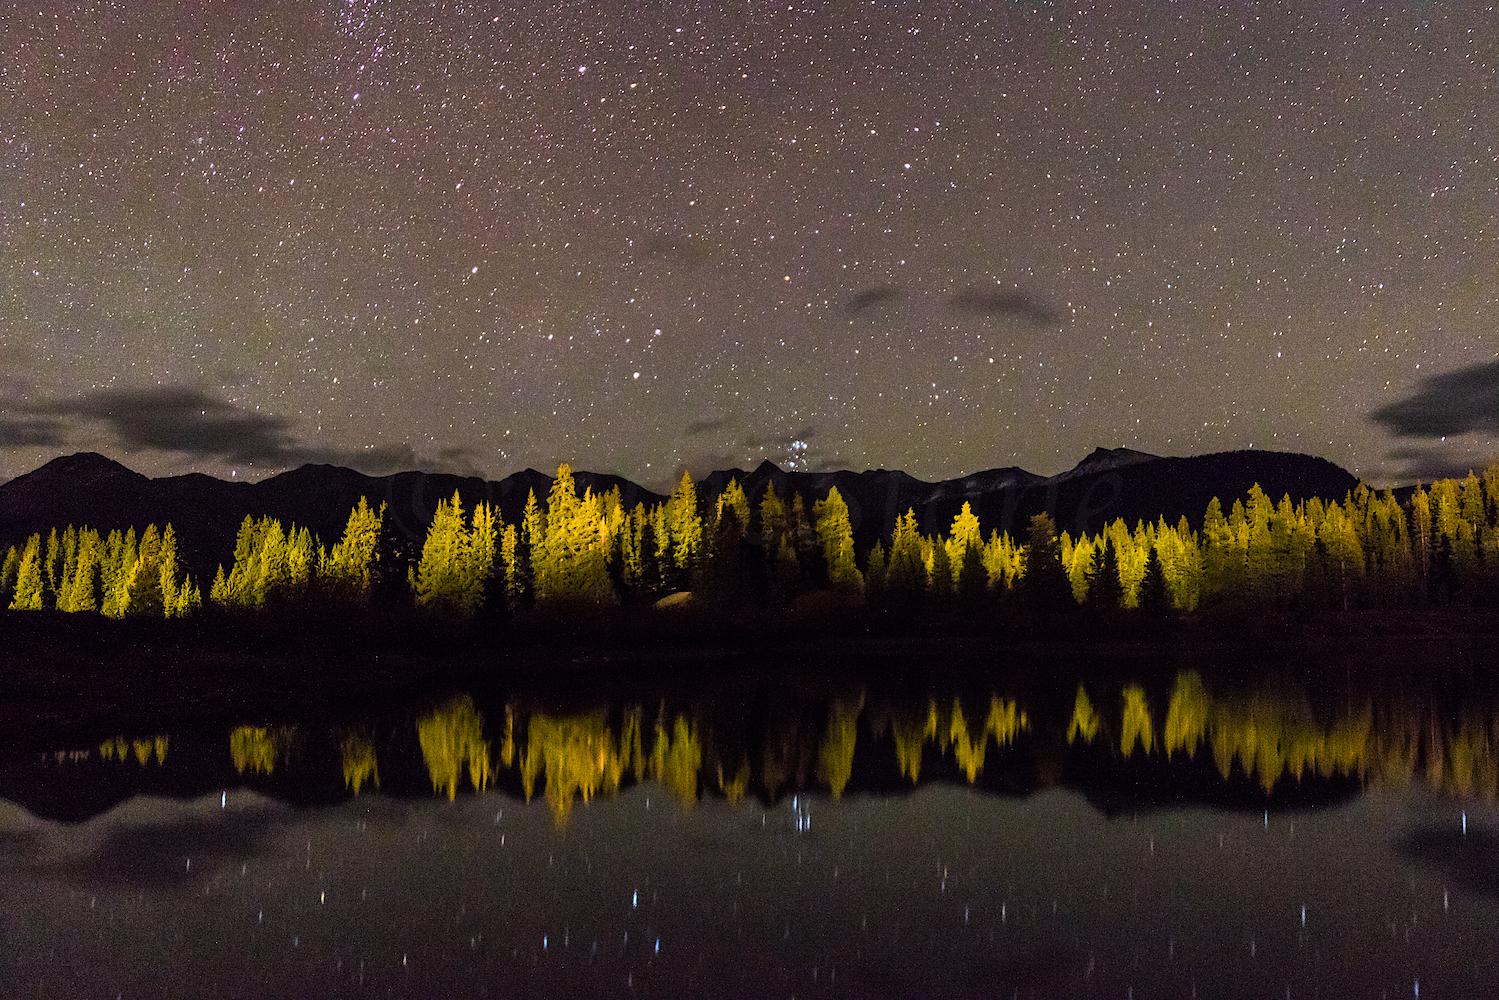 Molas Lake, Image # 0974